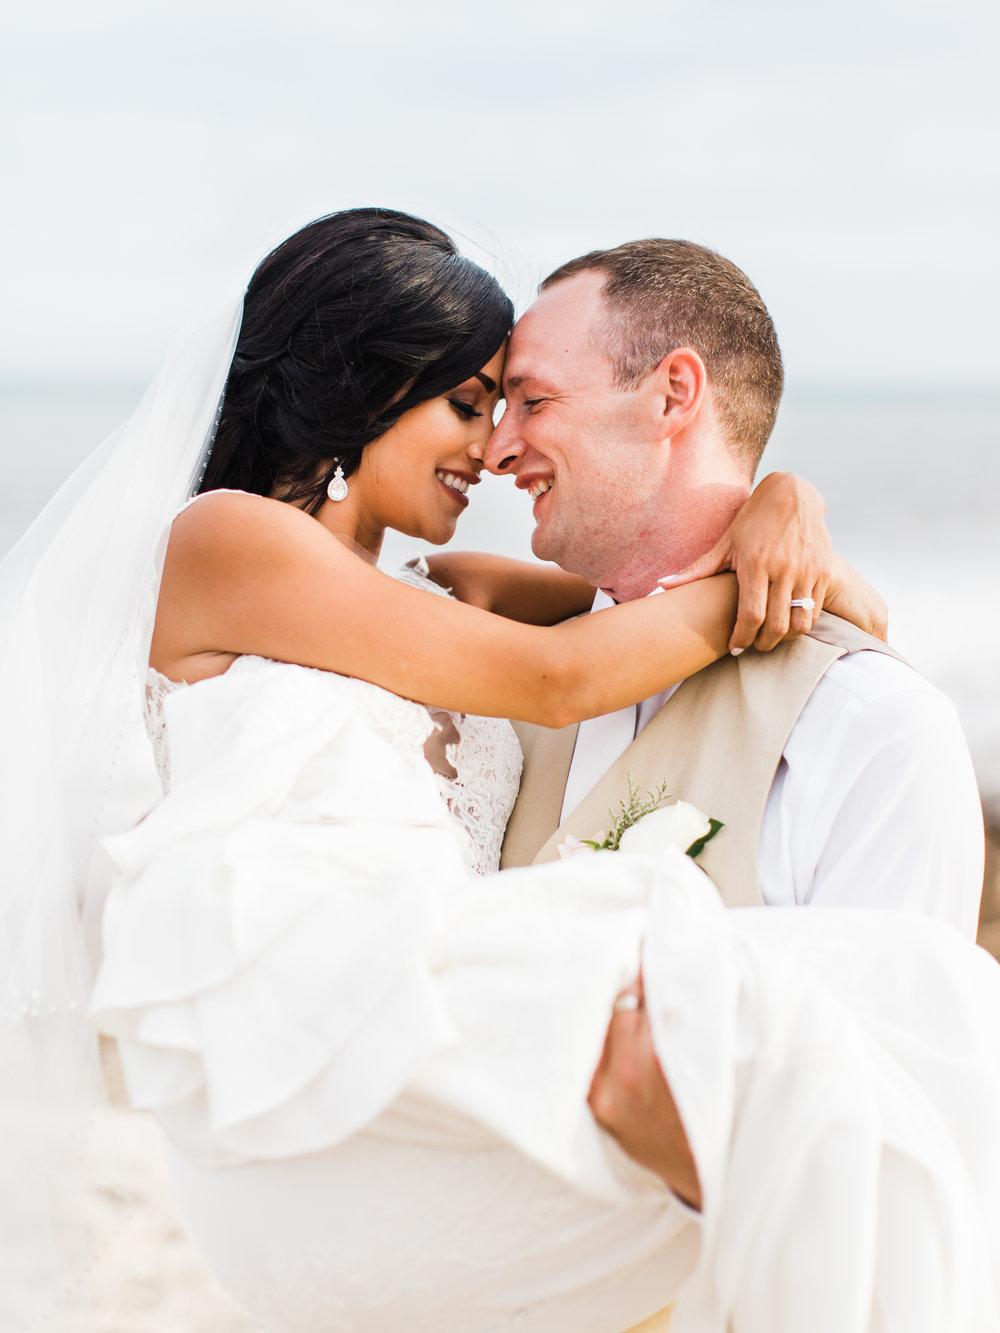 Deanna-and-John-Fahey-Wedding-Los-Cabos-Mexico-Brandon-J-Ferlin-Photography-302.jpg